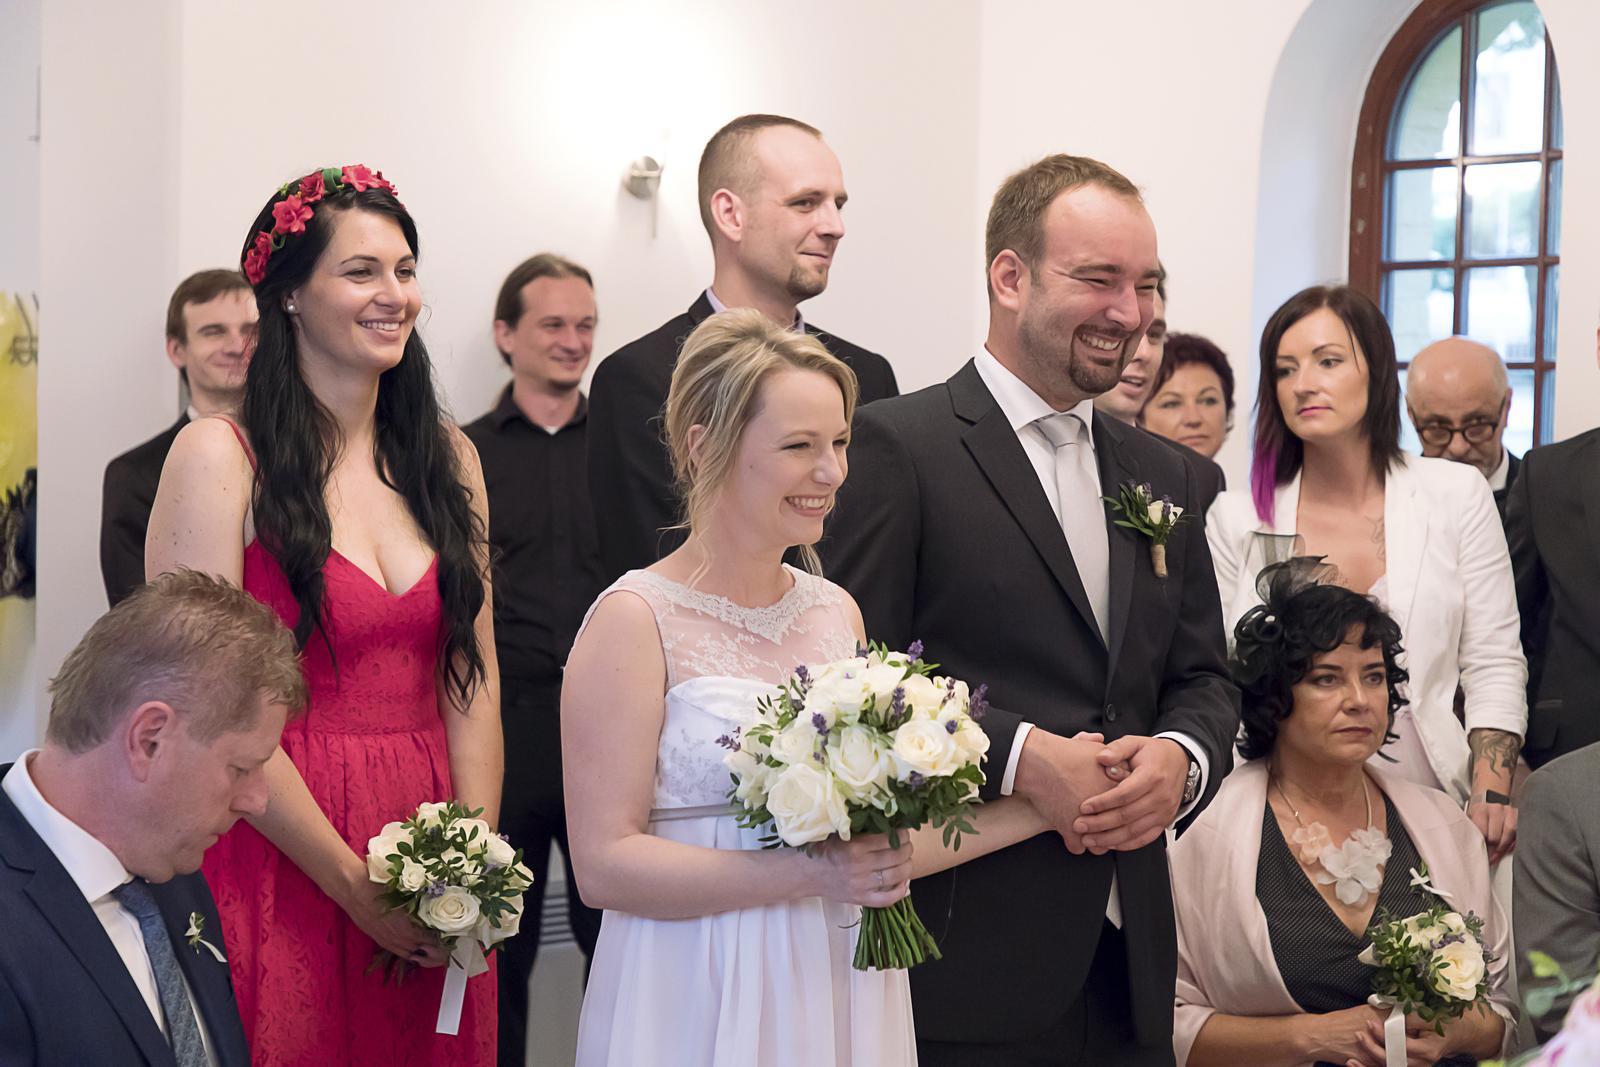 1.6.2018 svatba Jinočany - Obrázek č. 7